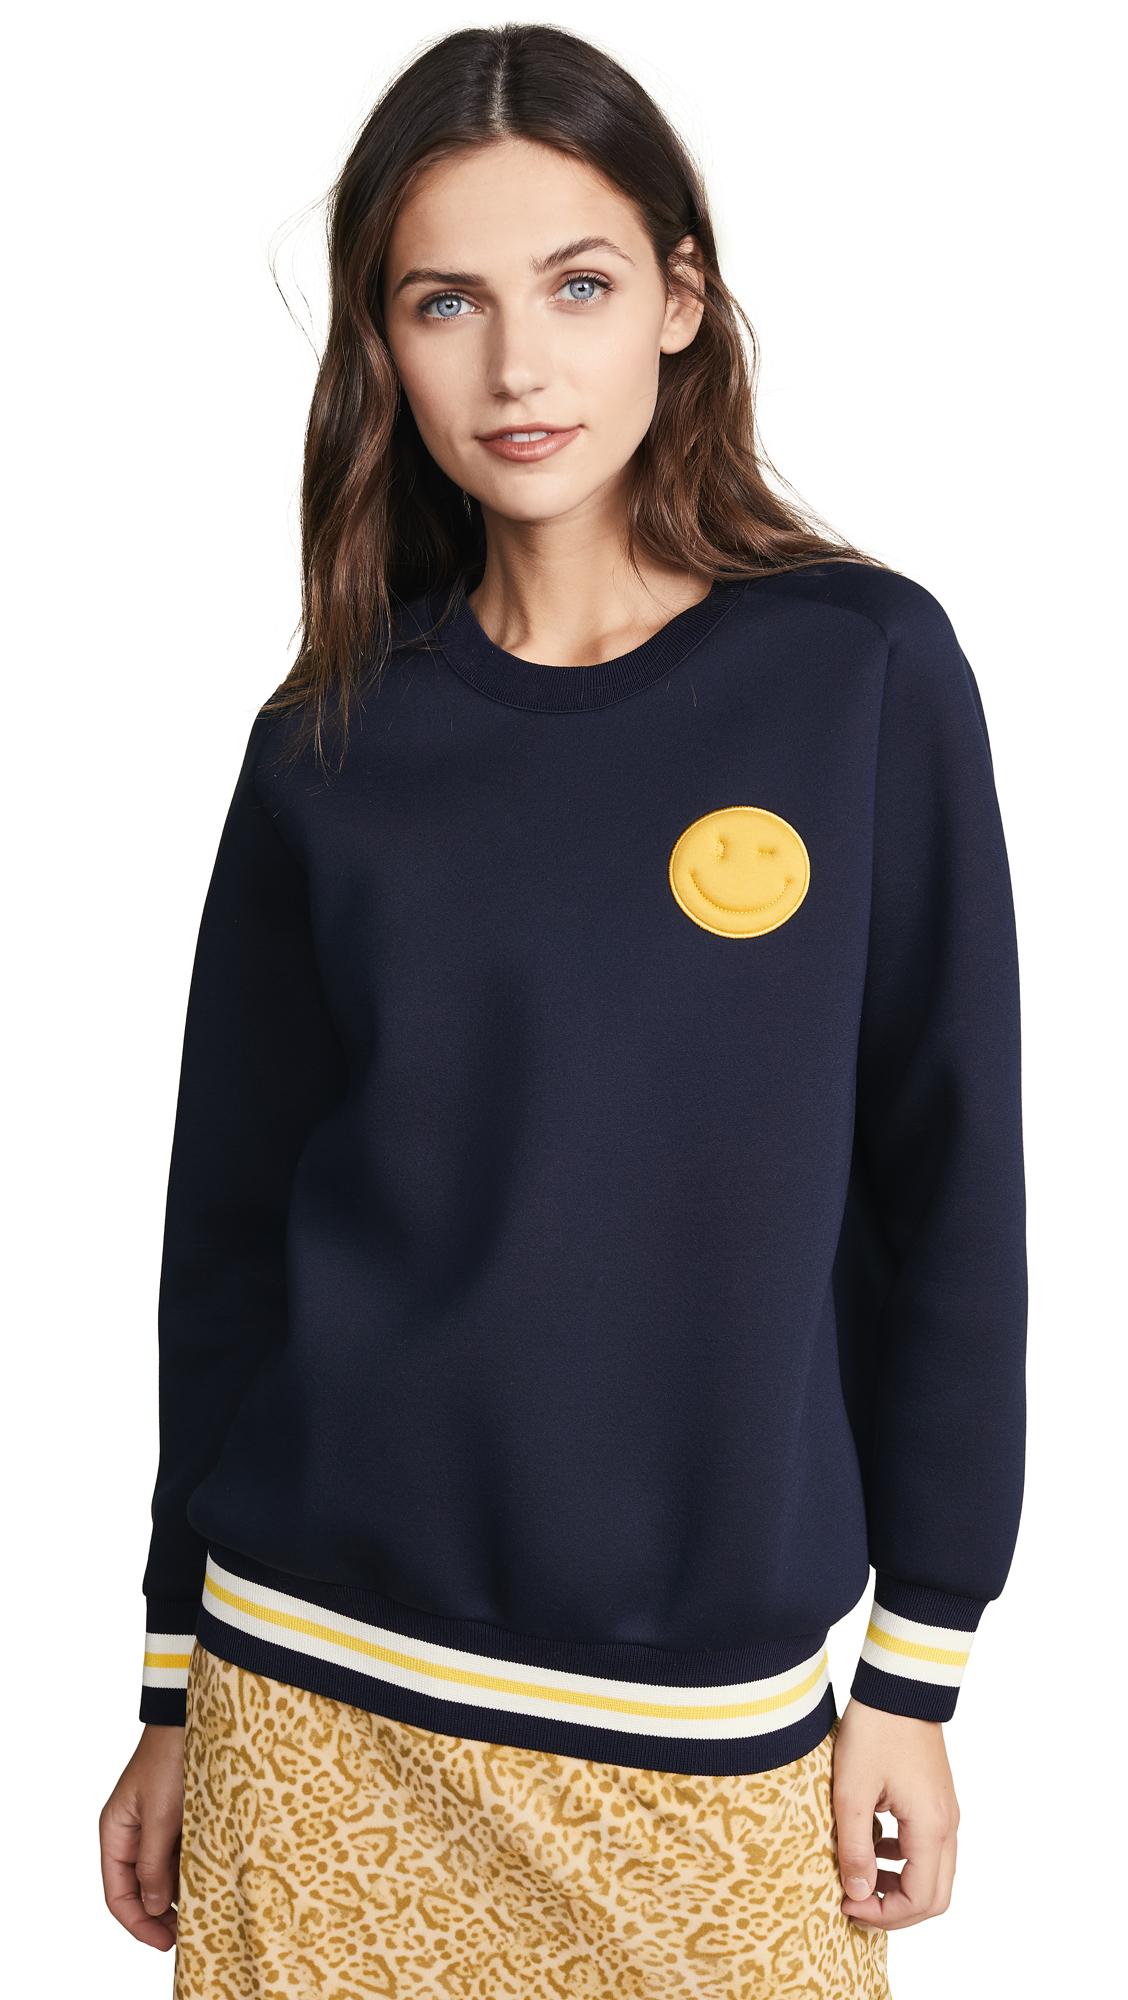 Anya Hindmarch Chubby Wink Sweatshirt In Marine